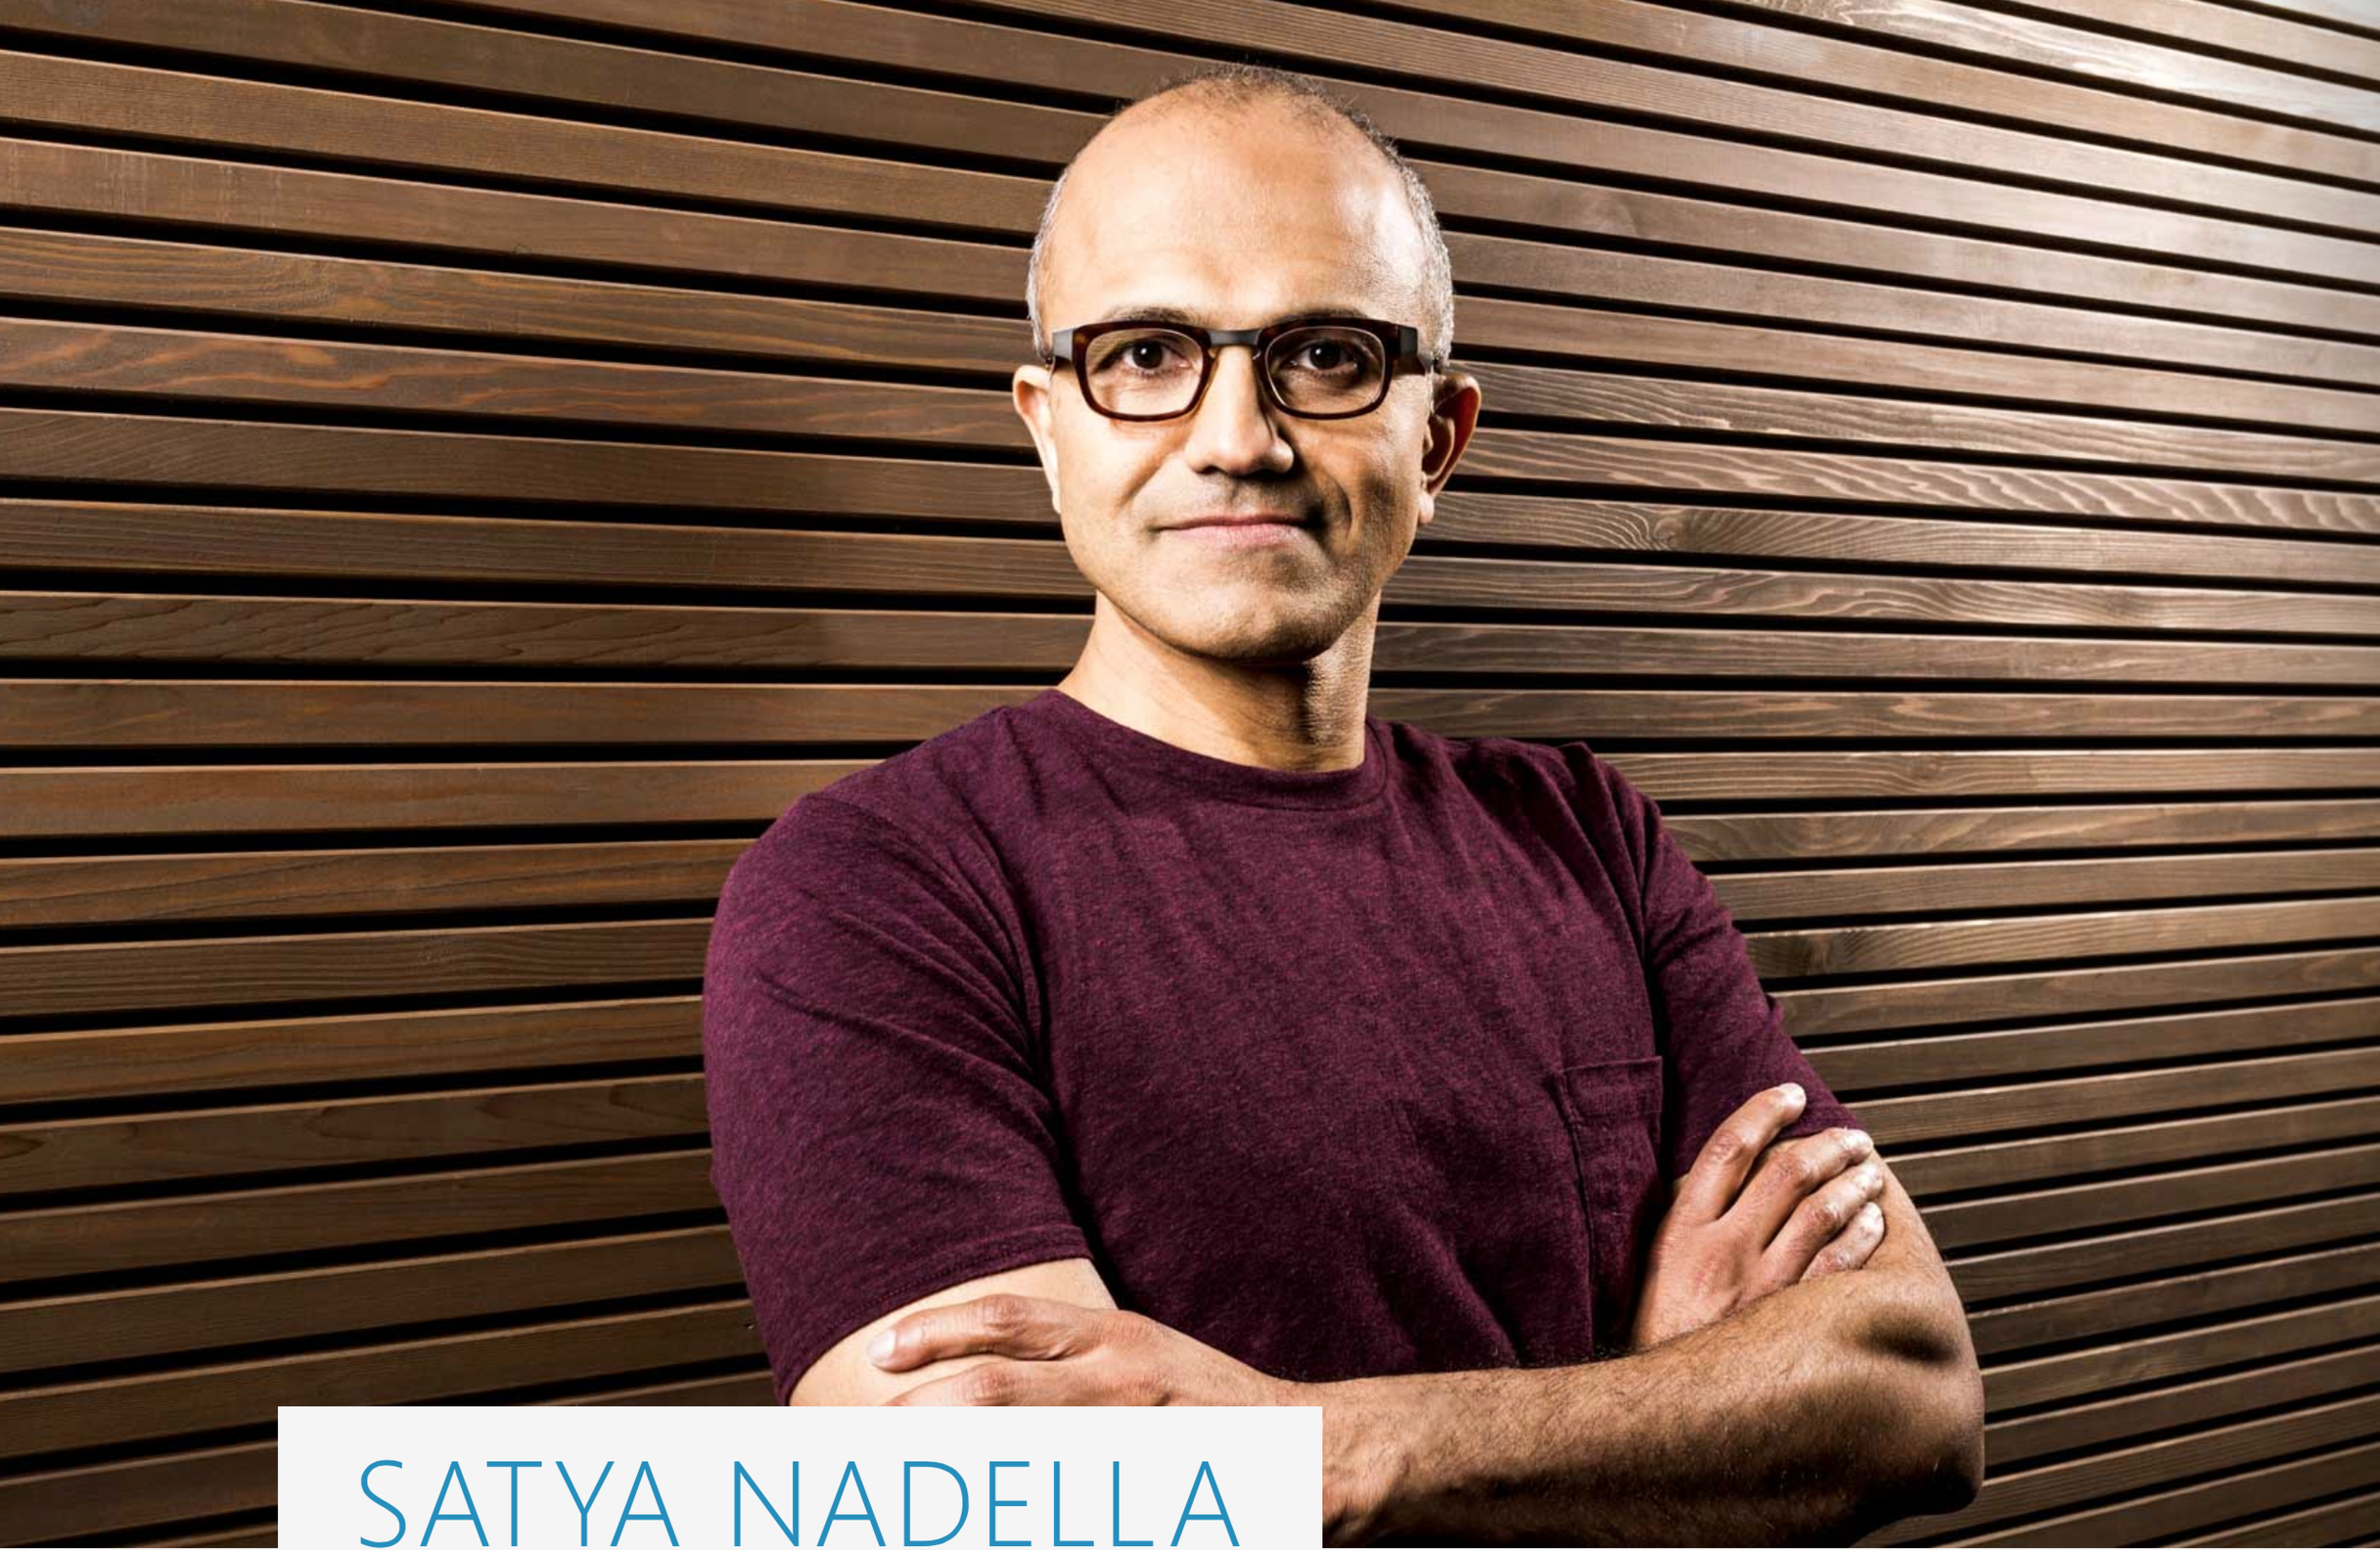 Satya Nadella, new CEO of Microsoft. Image Source:  Microsoft.